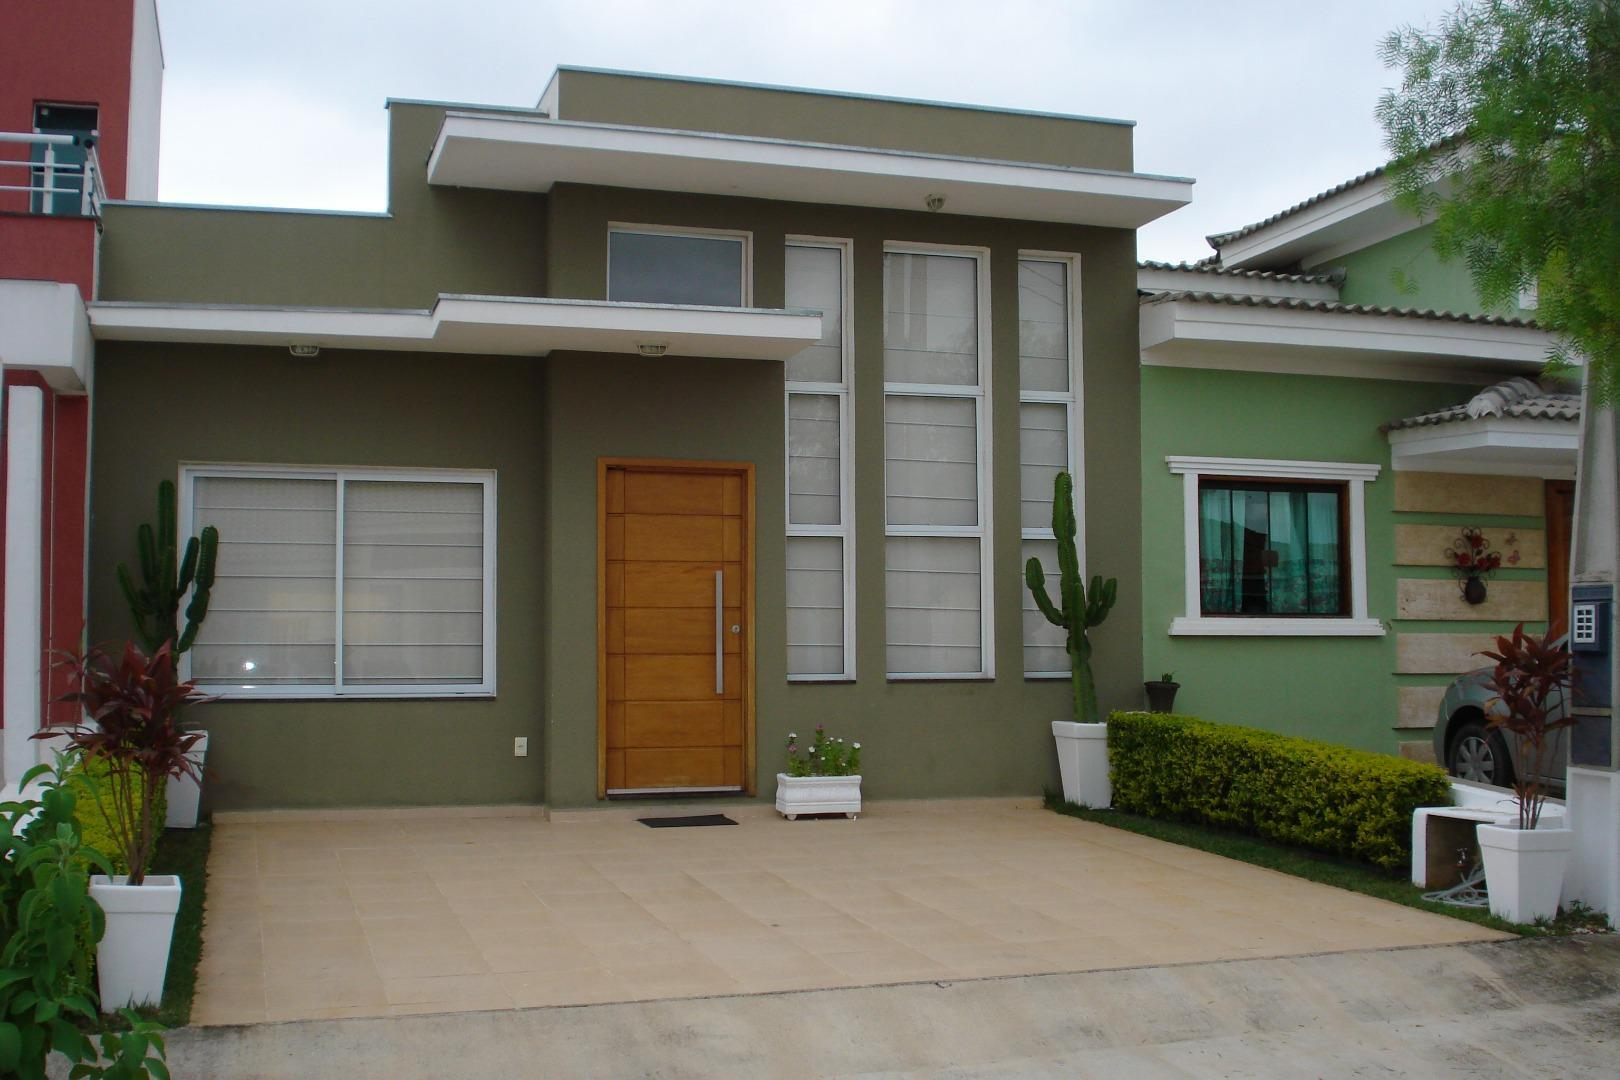 Casa residencial à venda, Condomínio Horto Florestal II, Sorocaba - CA1235.